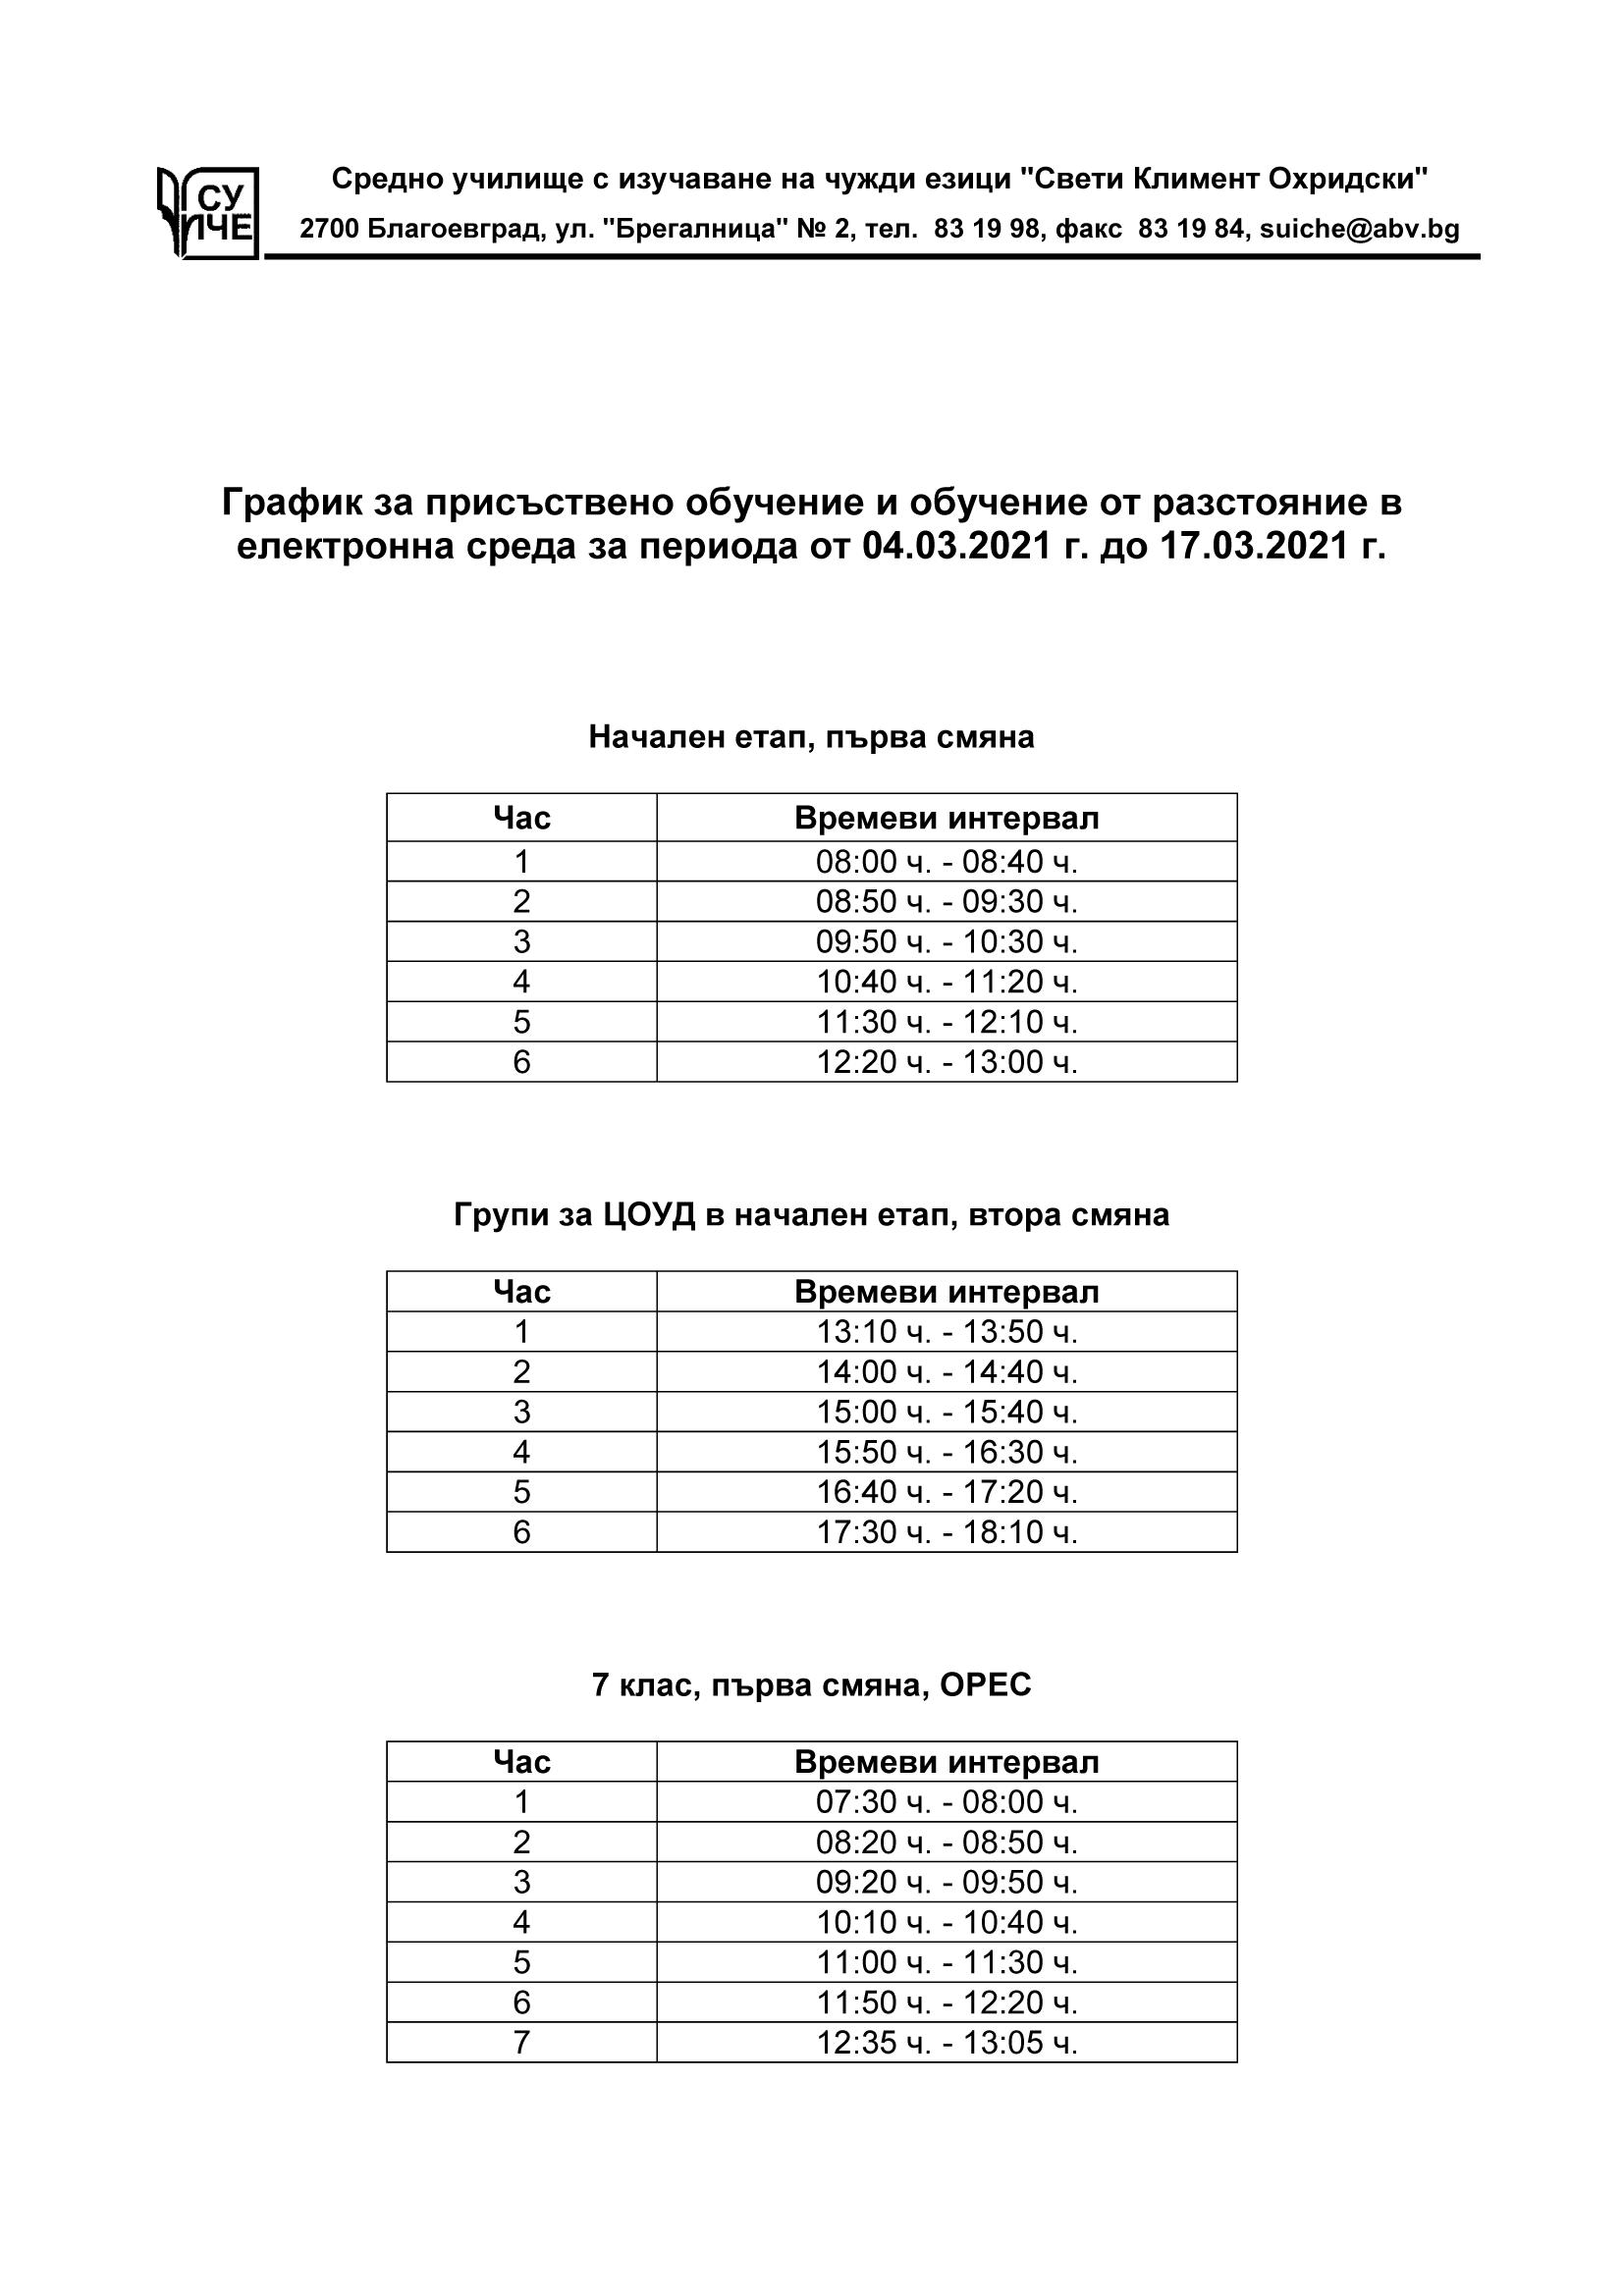 grafik04.03-17.03p1.png